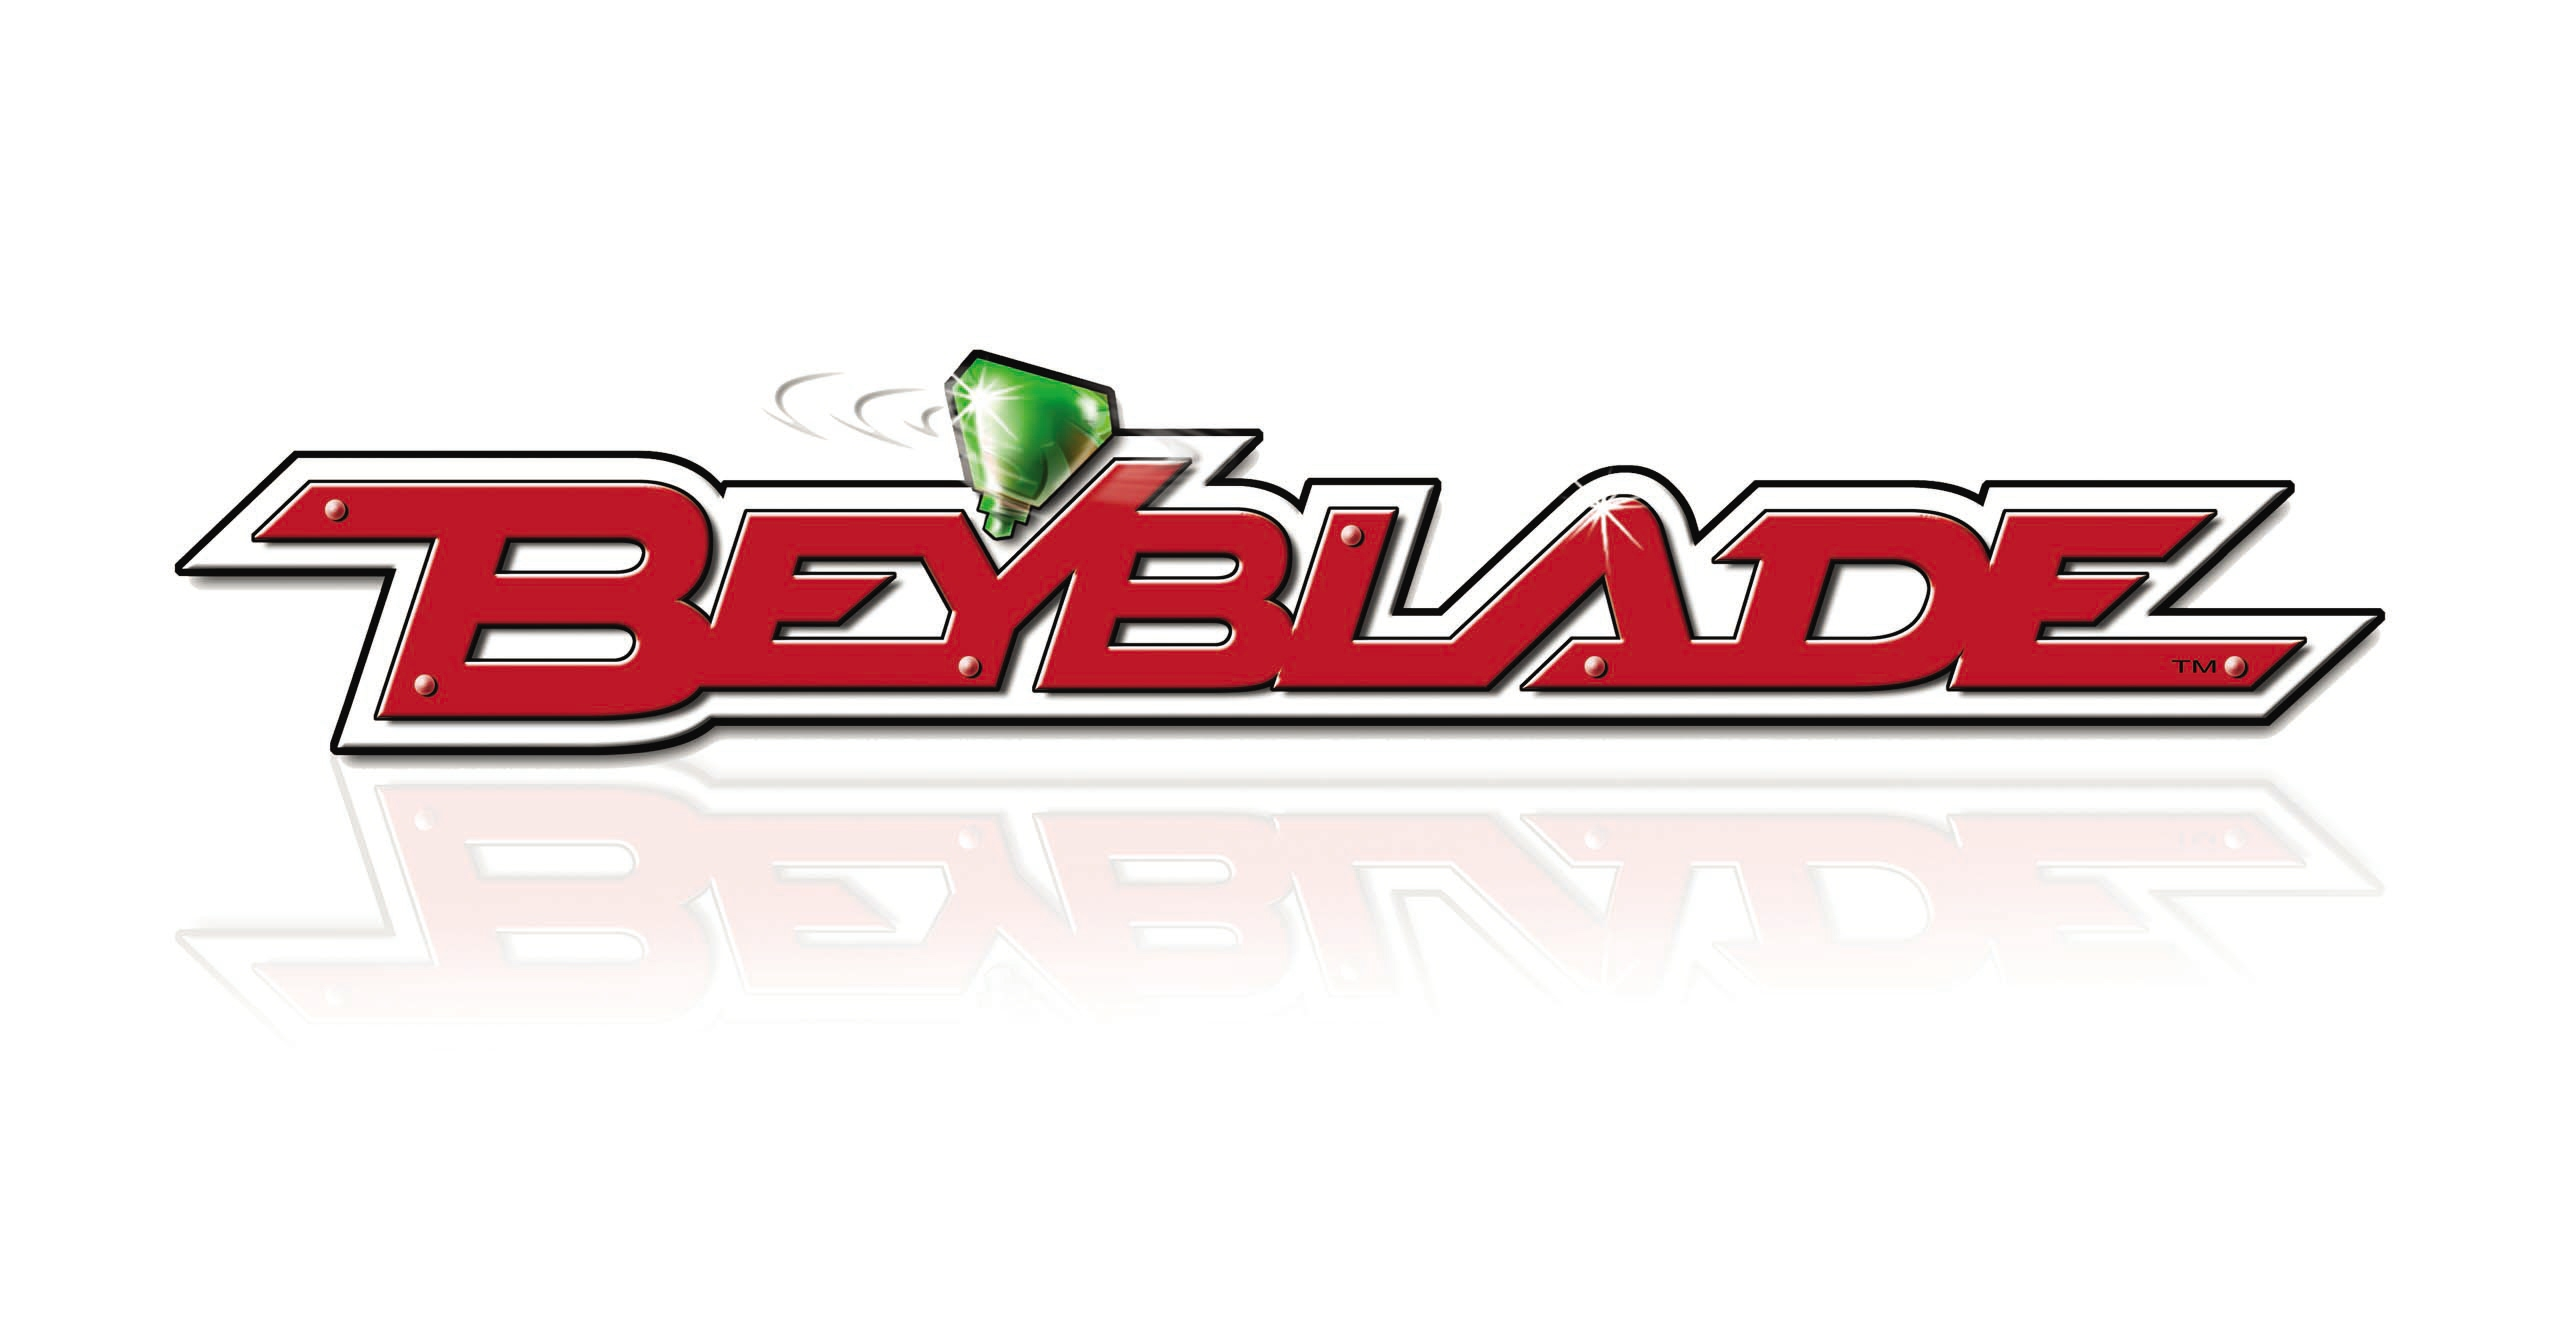 Beyblade (franchise)